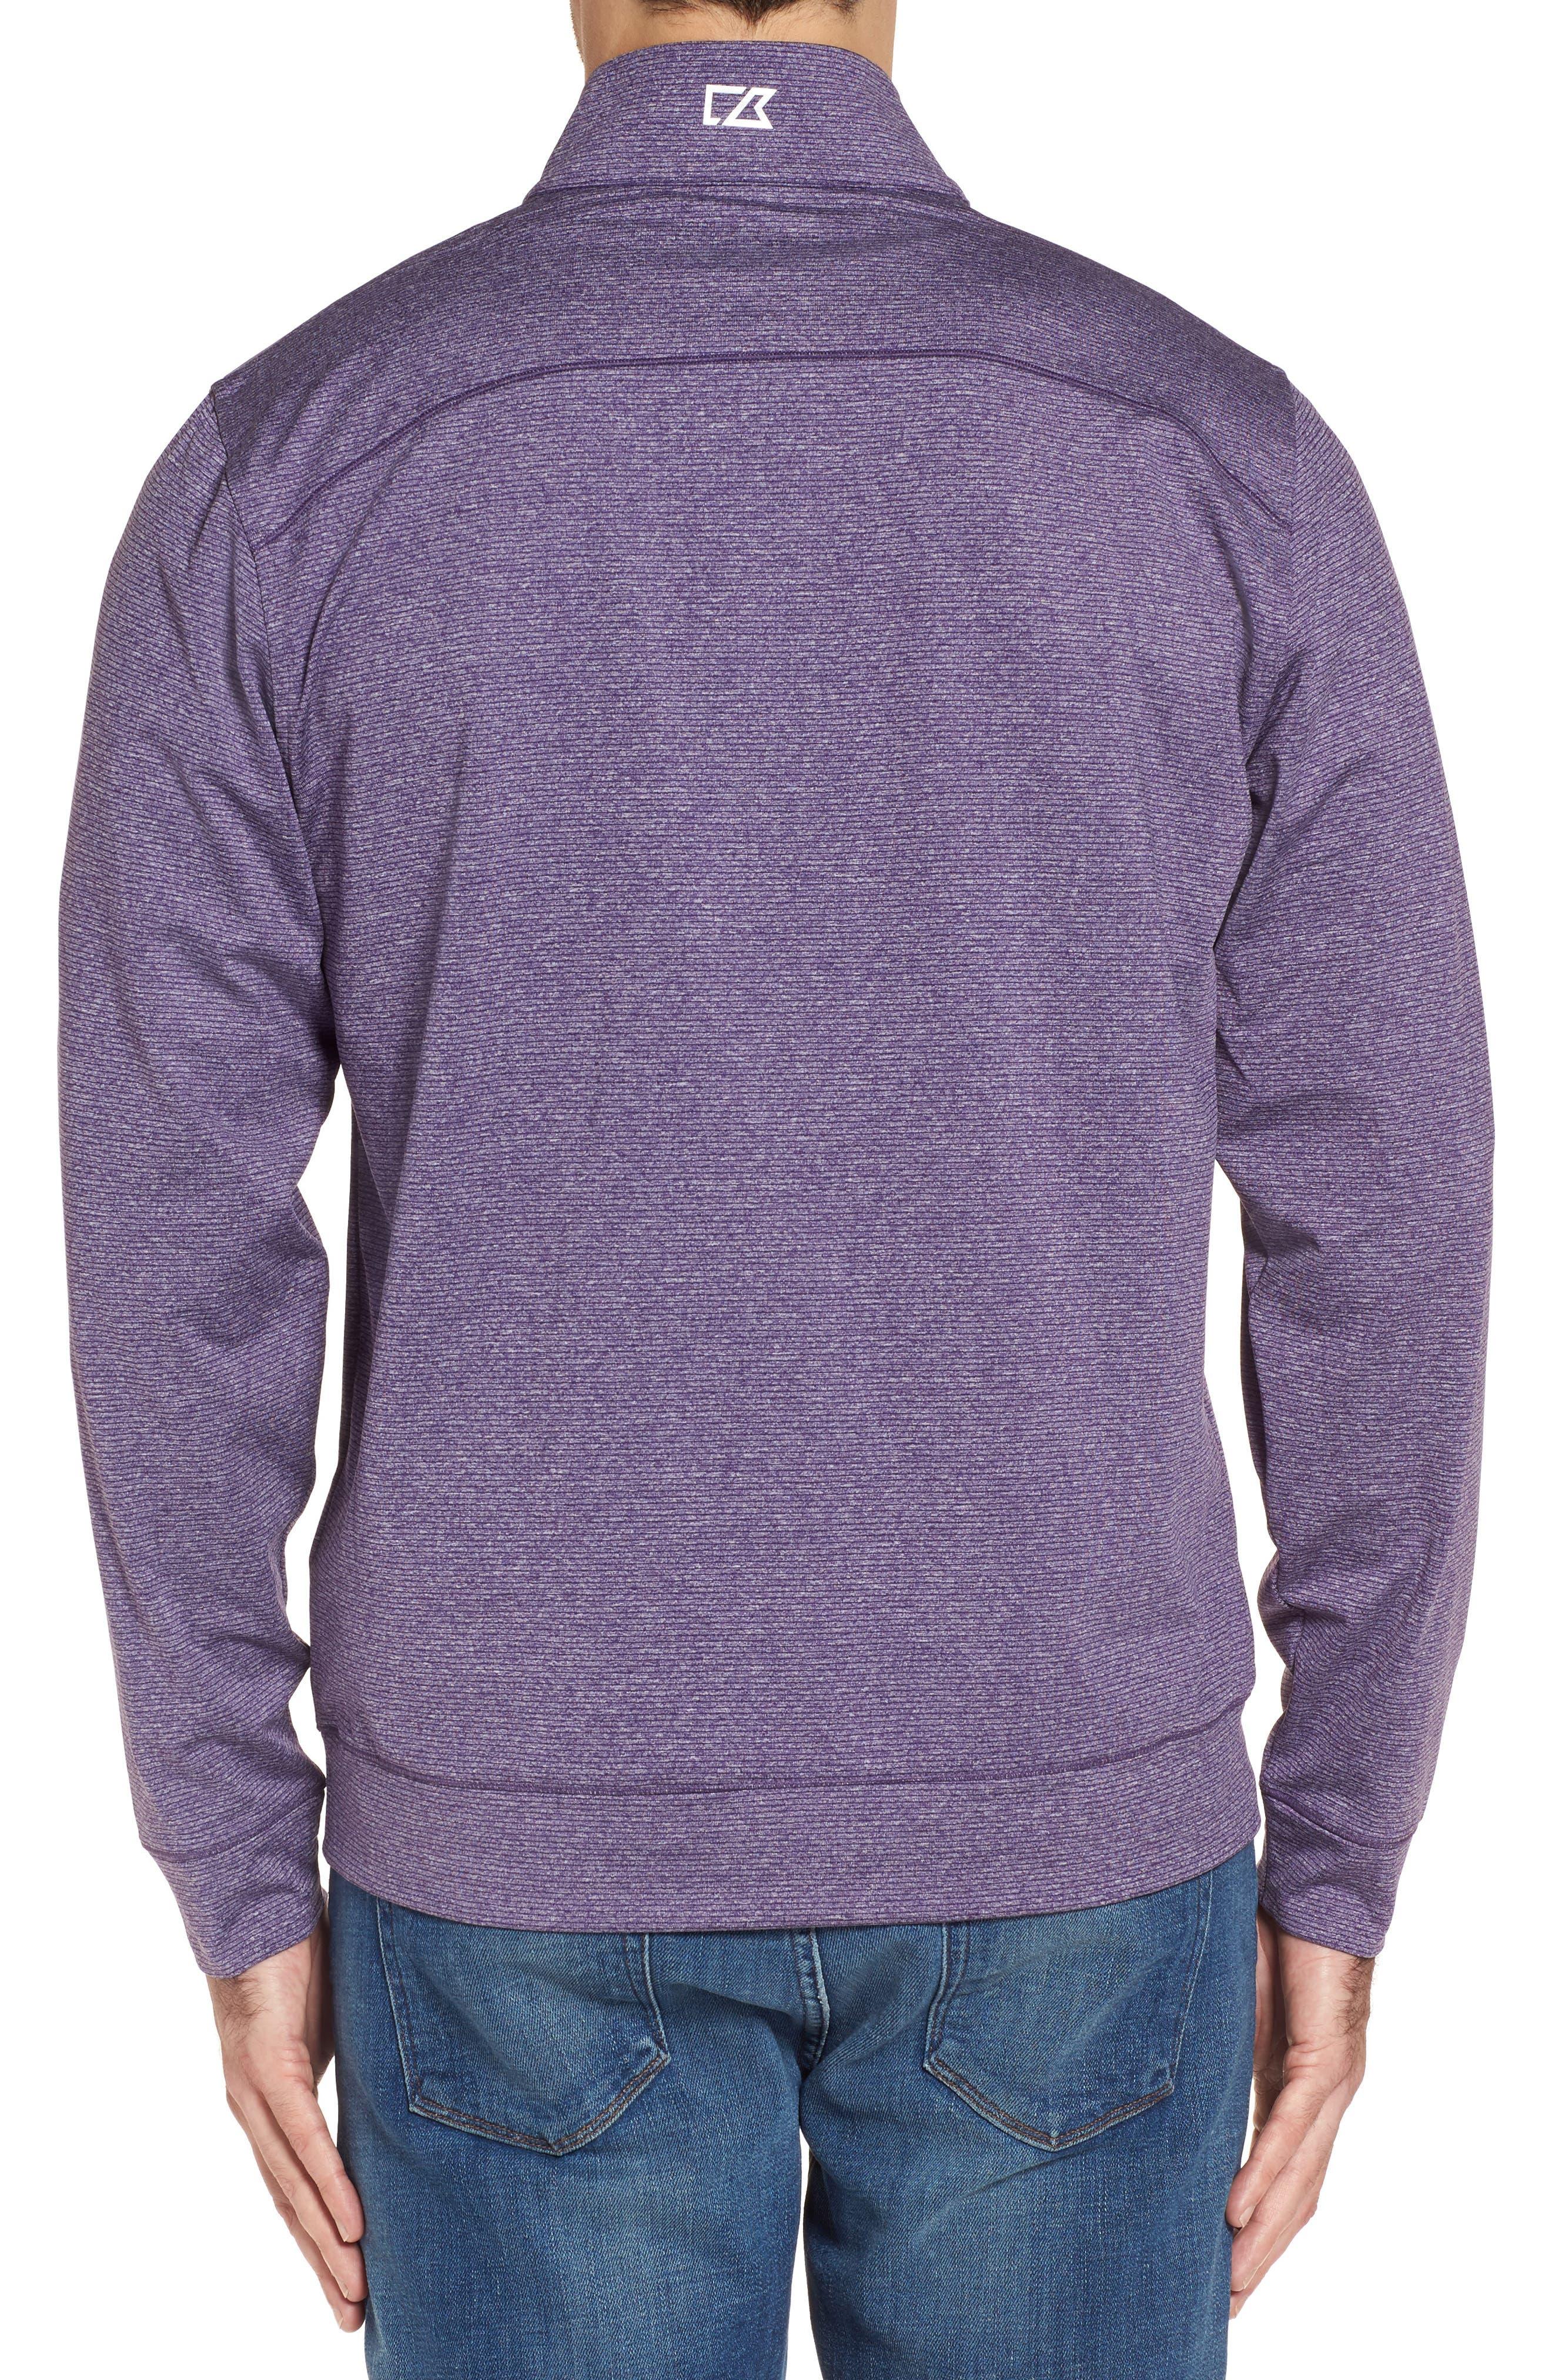 Shoreline - Minnesota Vikings Half Zip Pullover,                             Alternate thumbnail 2, color,                             College Purple Heather